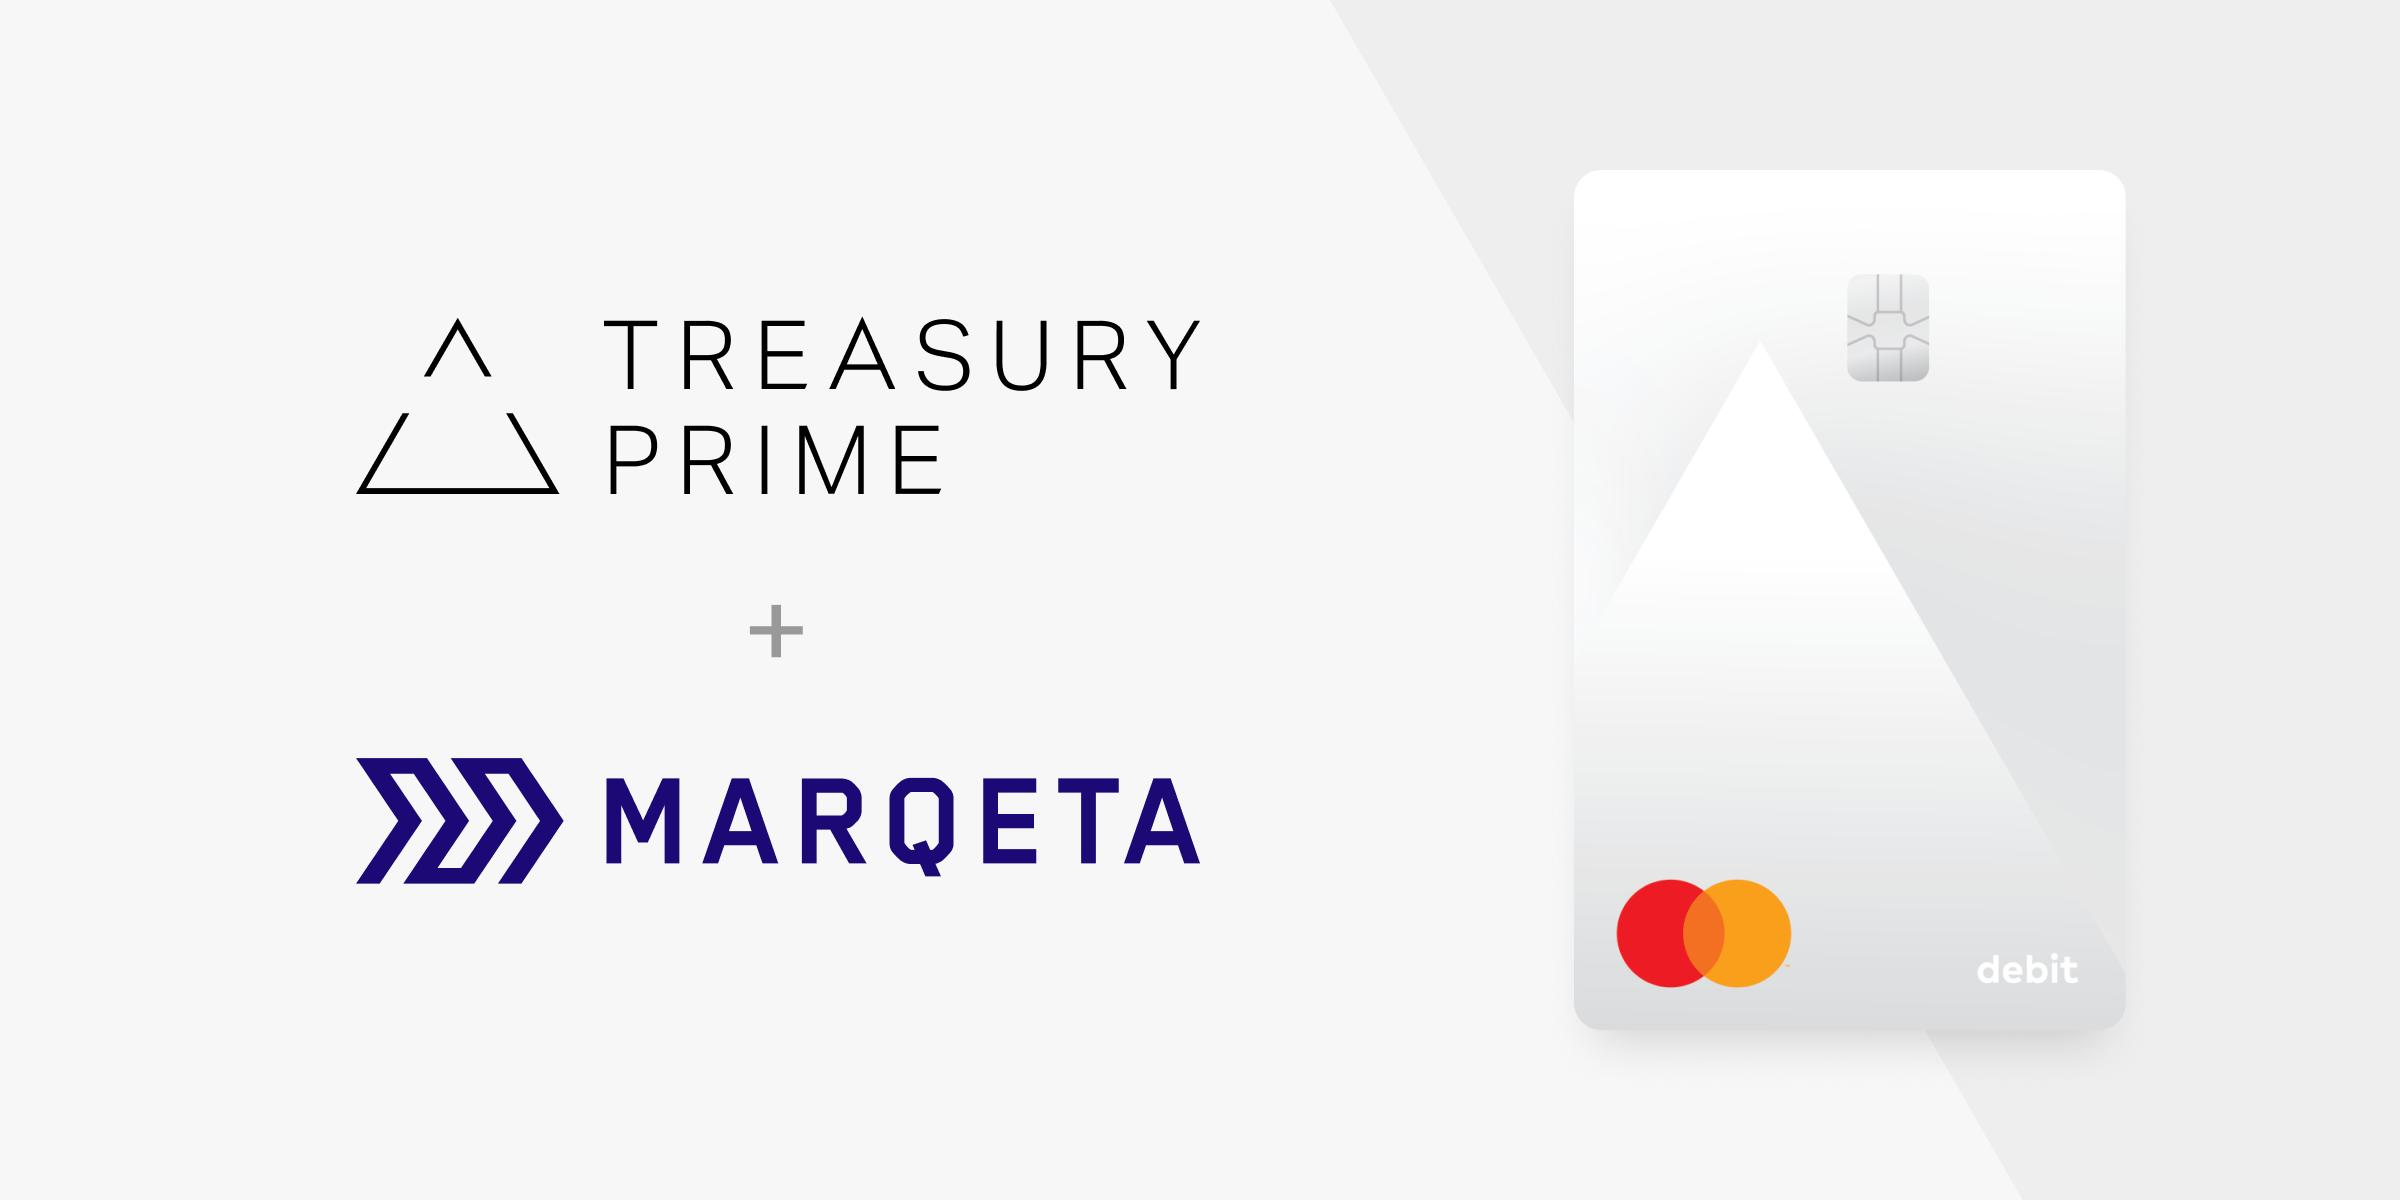 Treasury Prime & Marqeta logos with sample debit card